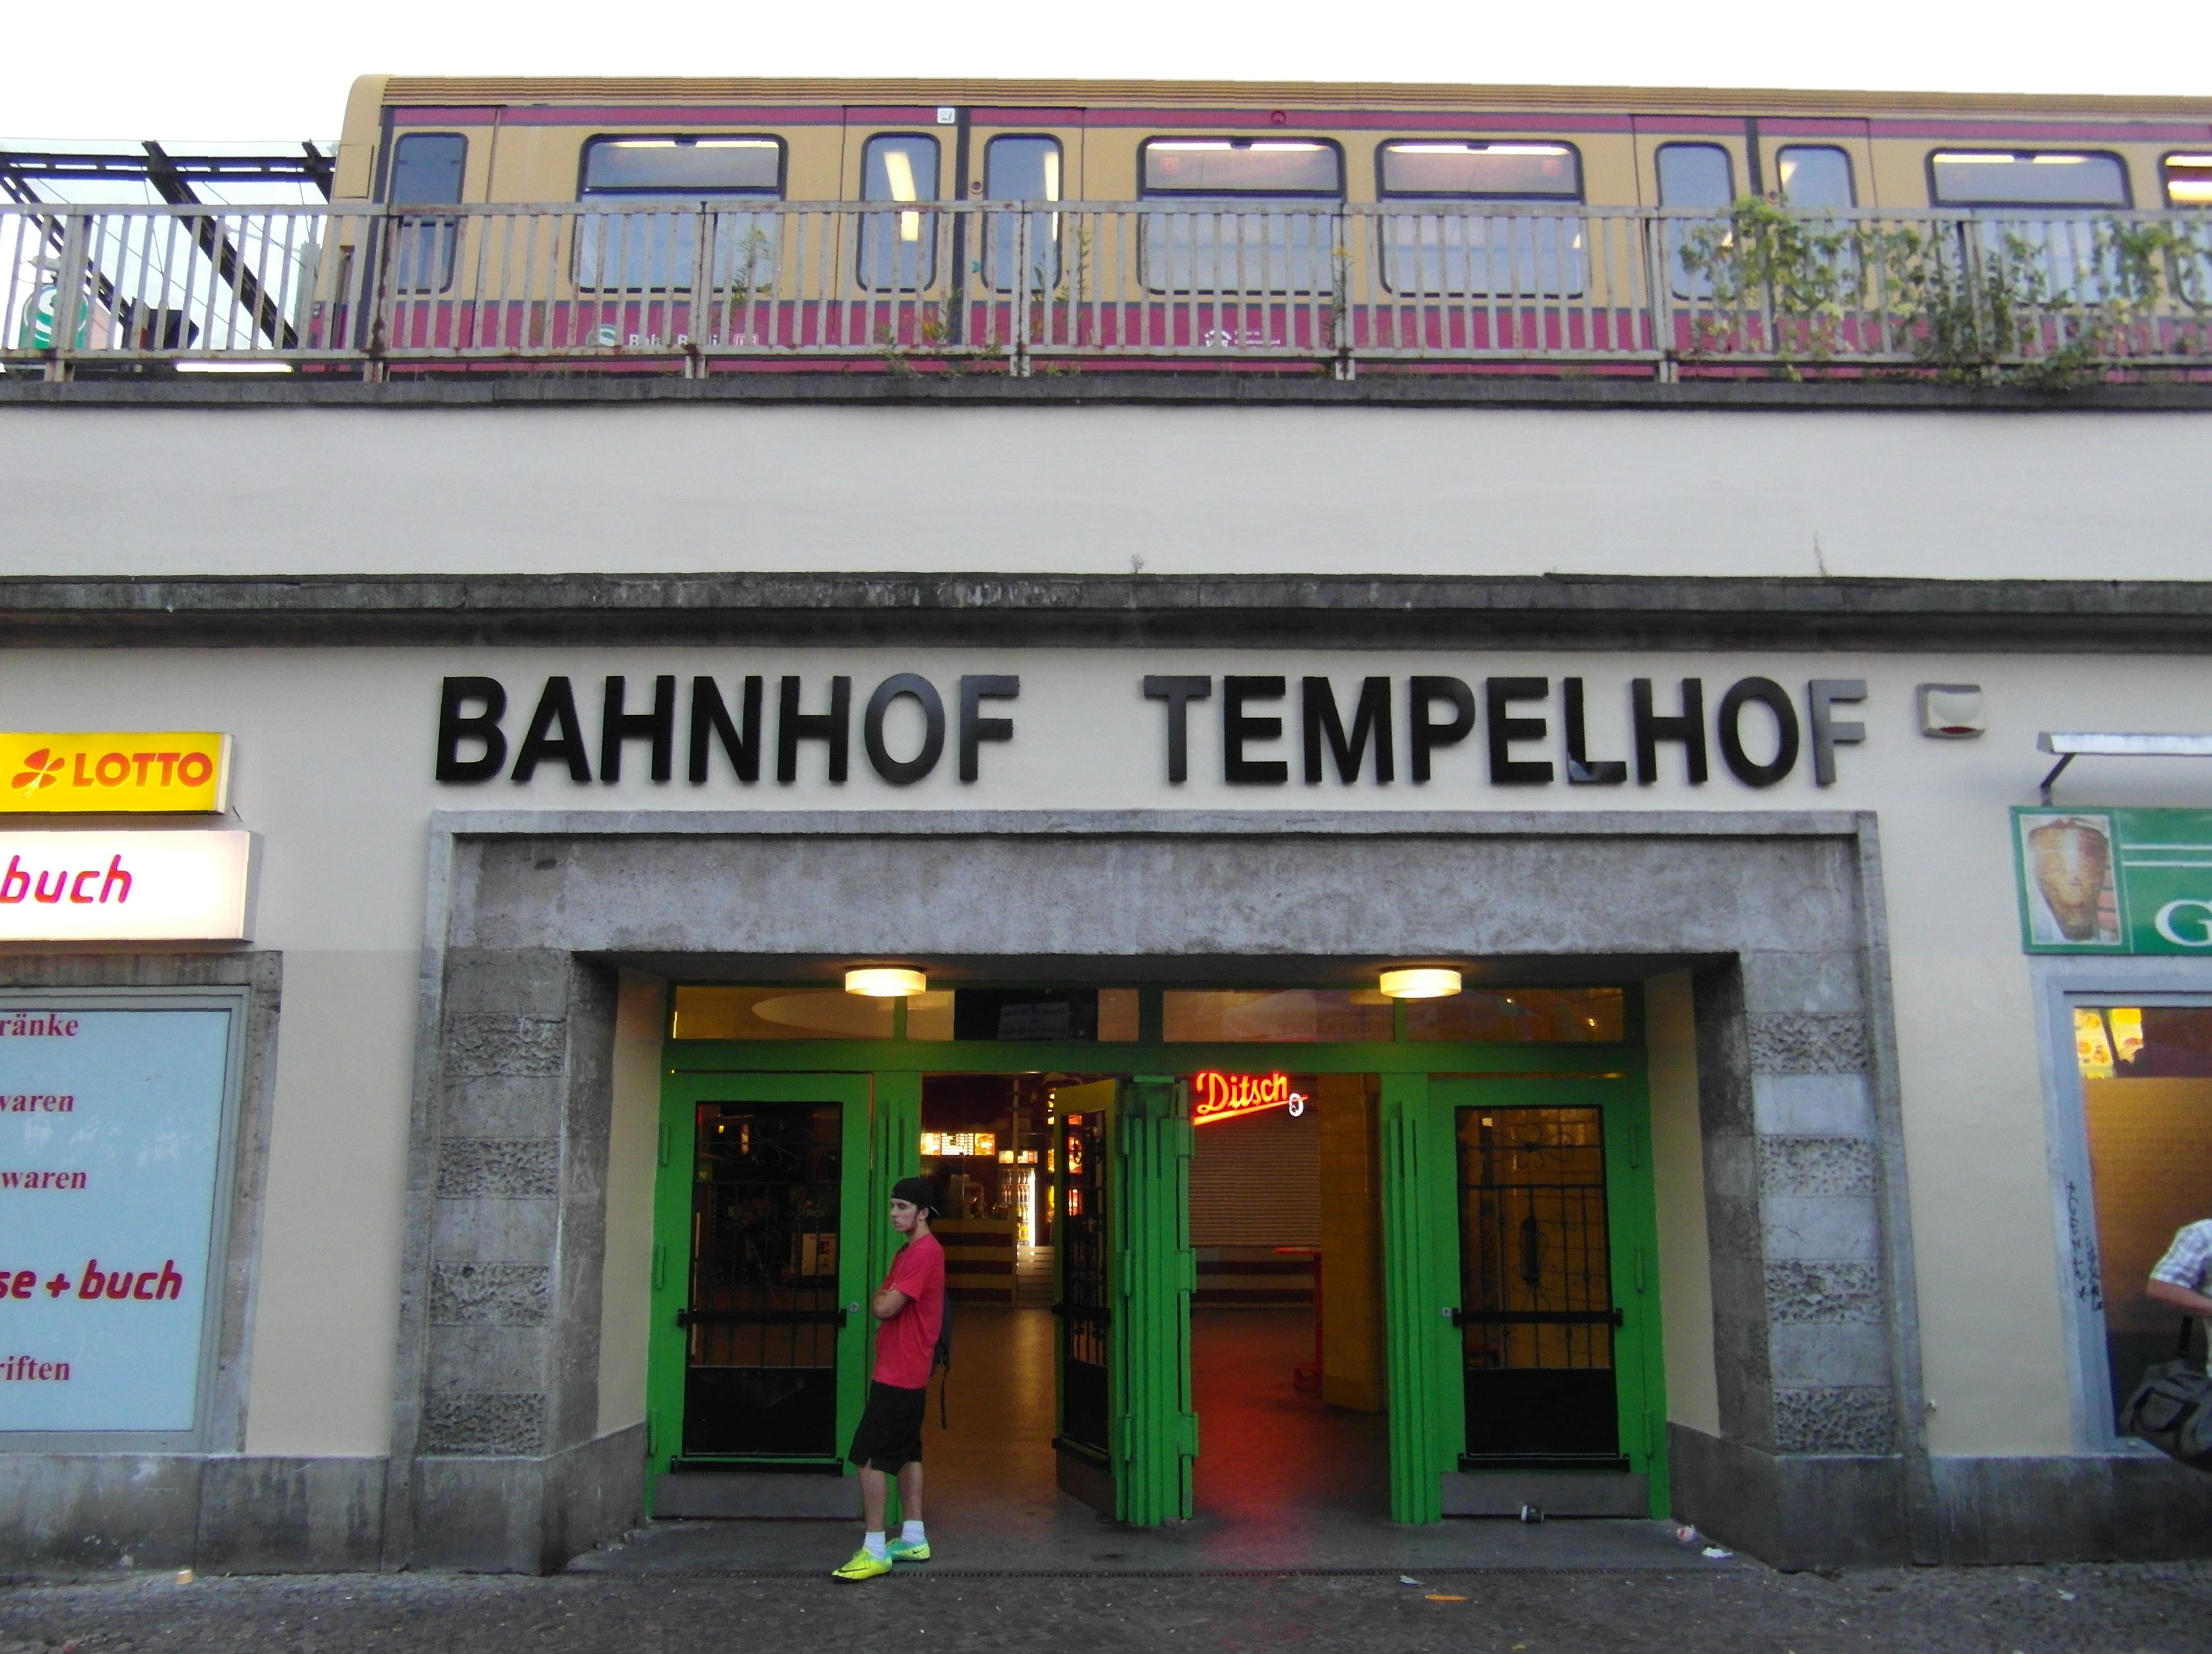 file flickr ingolfbln berlin s bahnhof tempelhof 4 jpg wikimedia commons. Black Bedroom Furniture Sets. Home Design Ideas